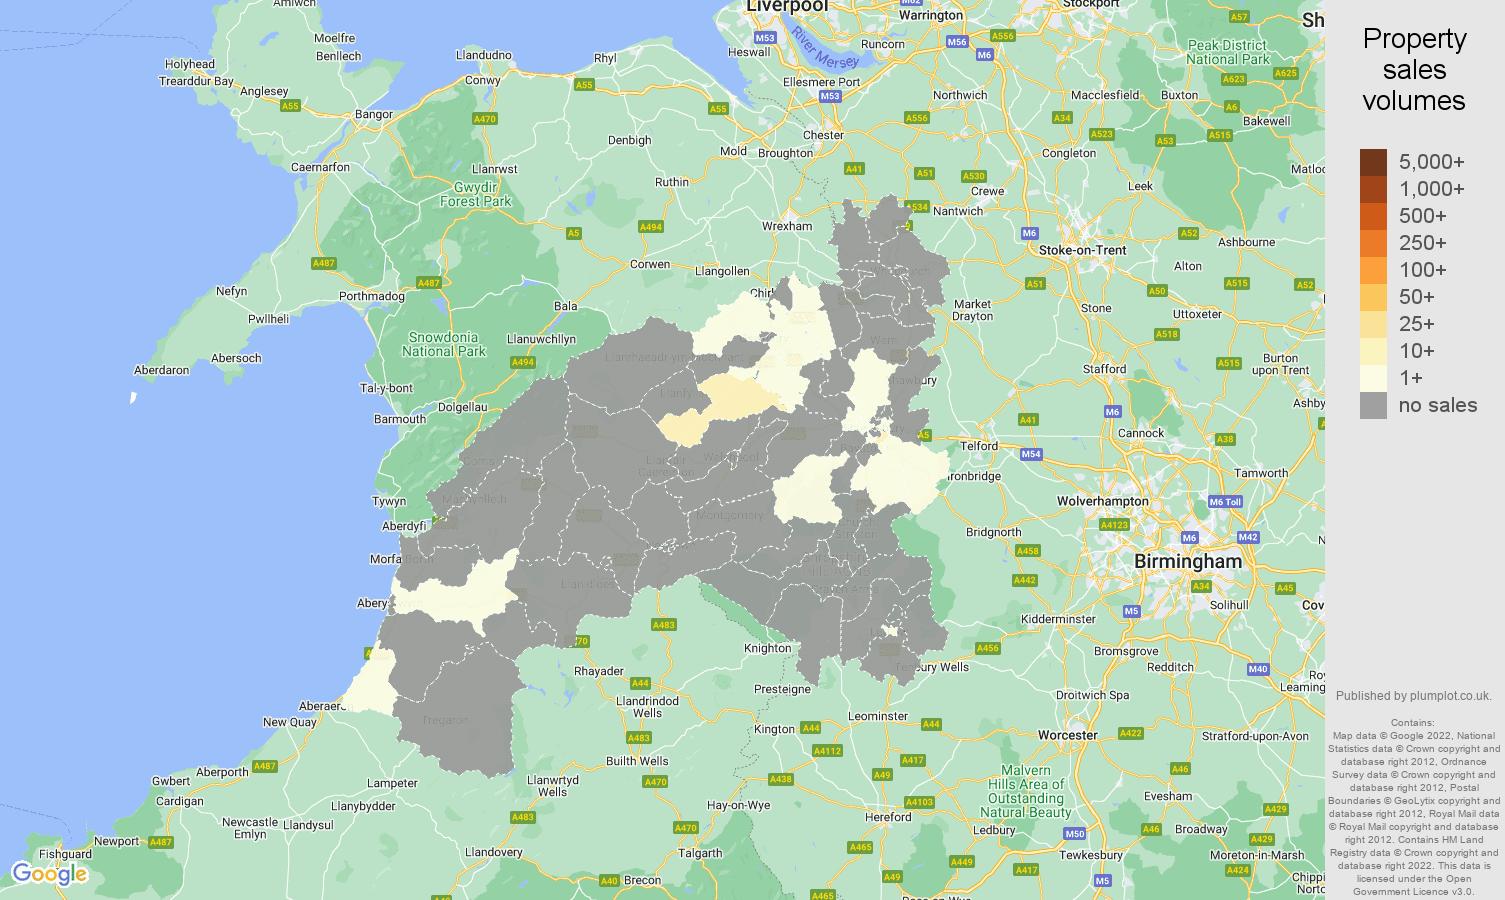 Shrewsbury map of sales of new properties